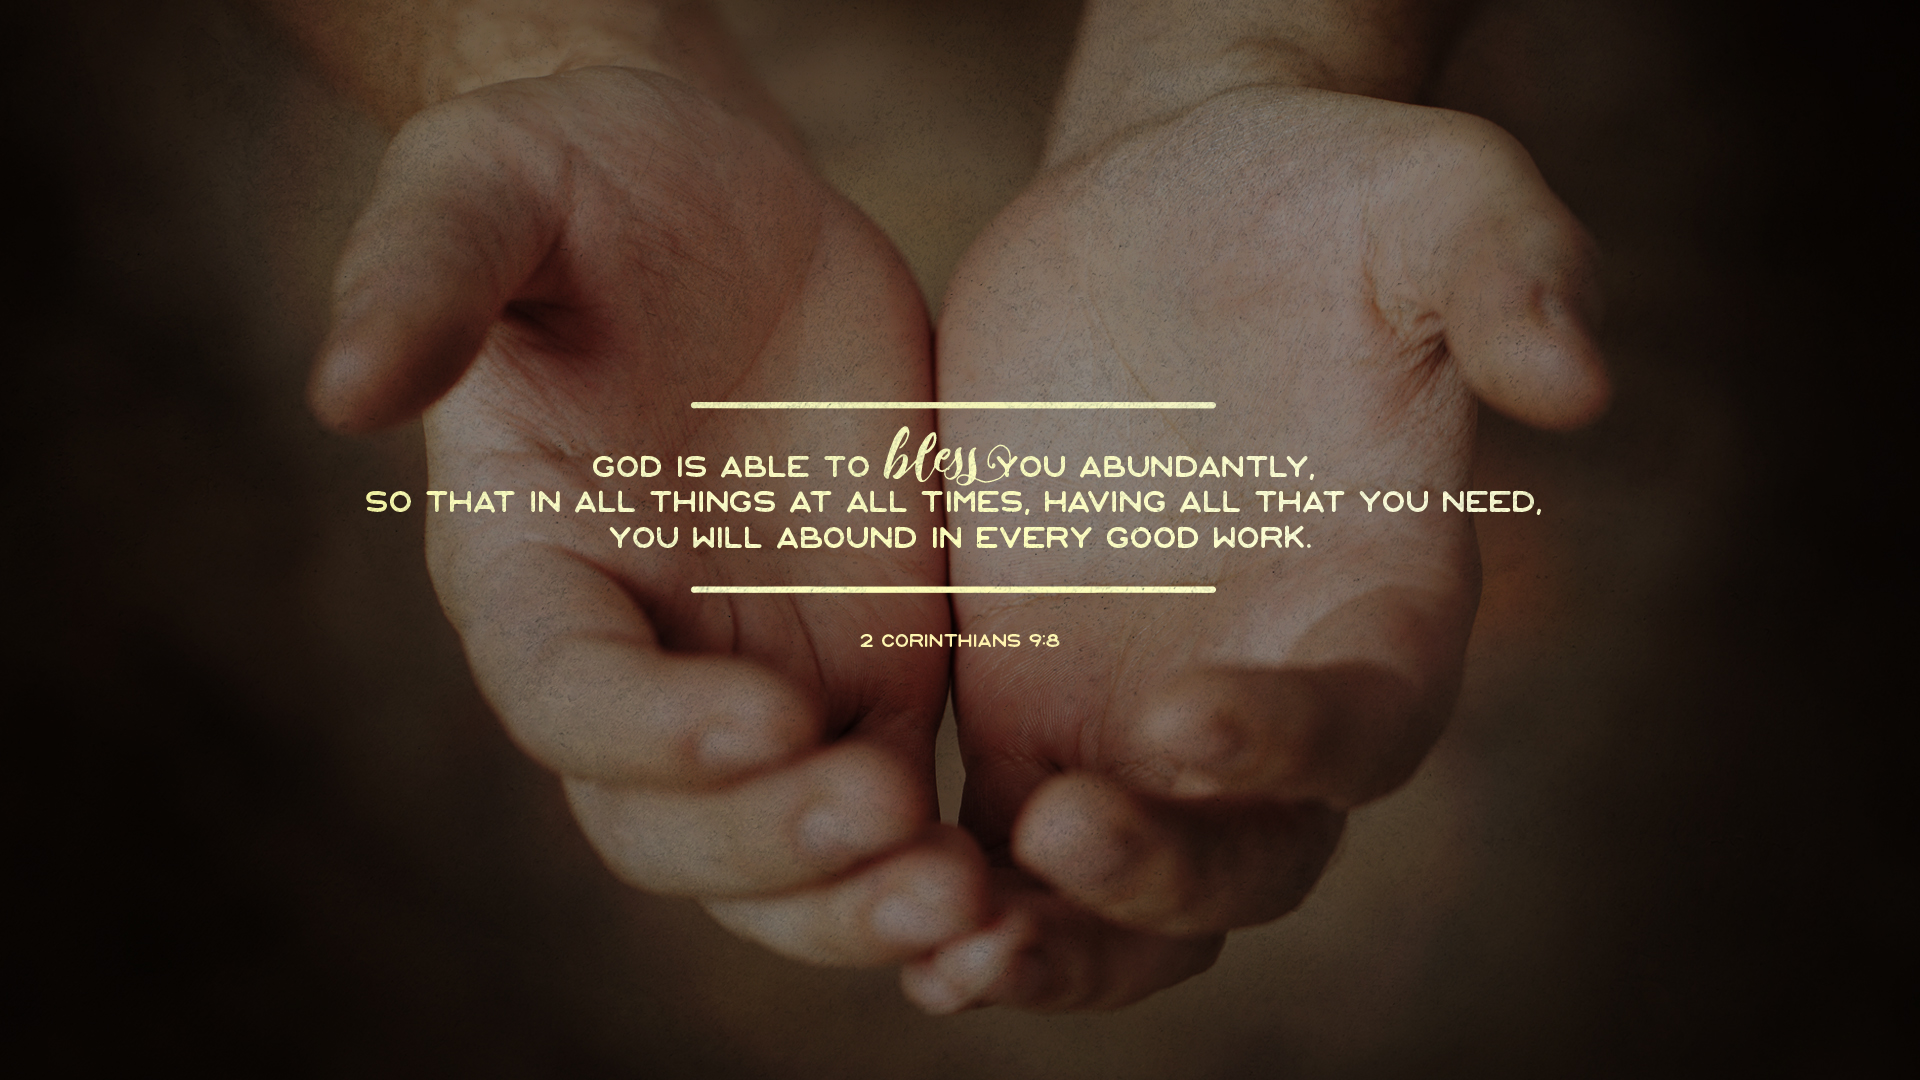 2 Corinthians 2:8-9 DESKTOP